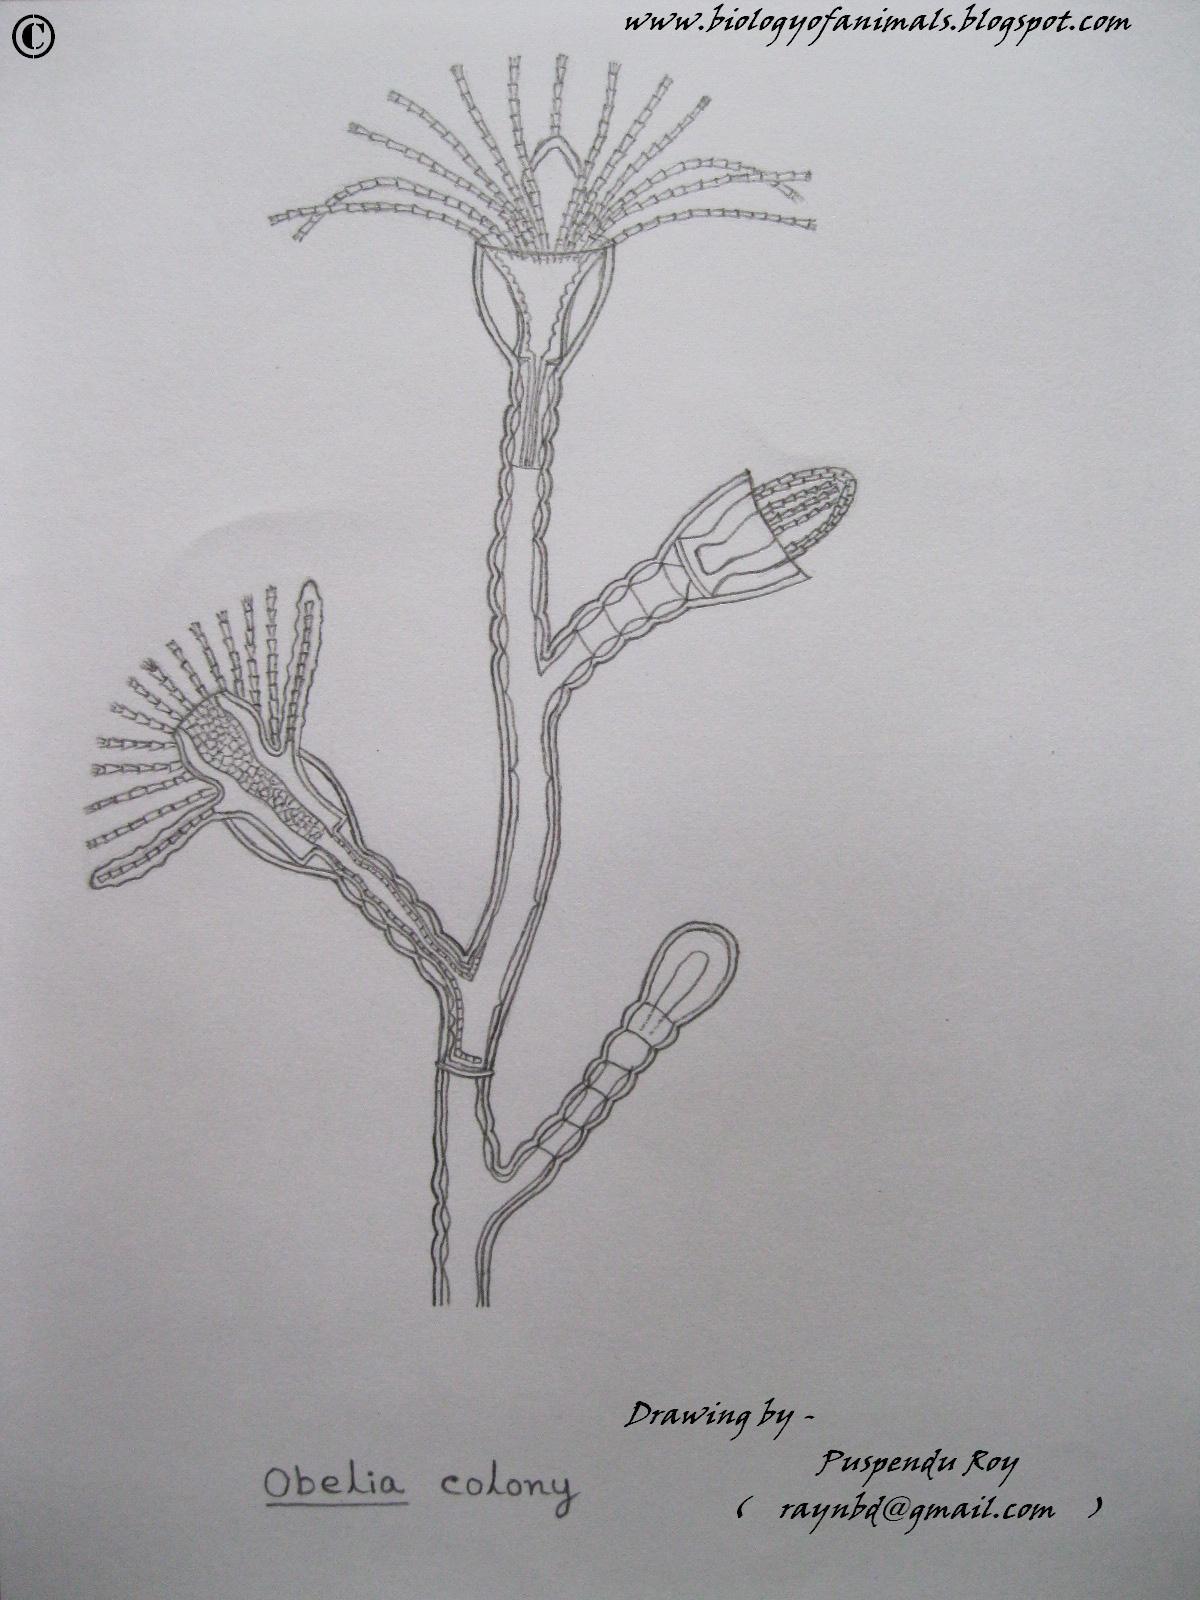 Biology Of Animals  Sketch Of Obelia Colony